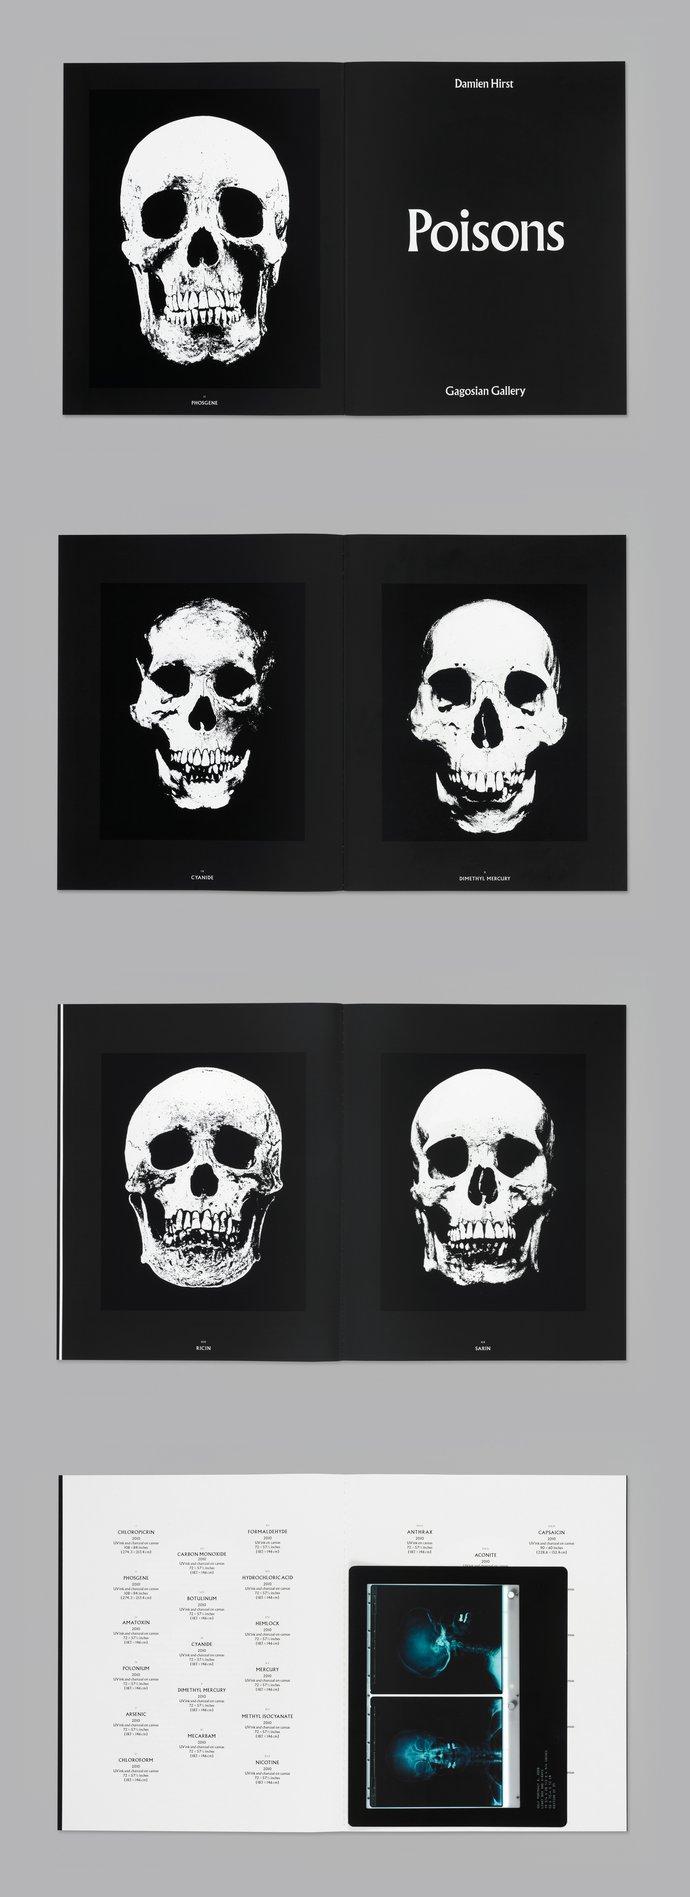 Gagosian – Damien Hirst: Poisons + Remedies, 2011 (Publication), image 4